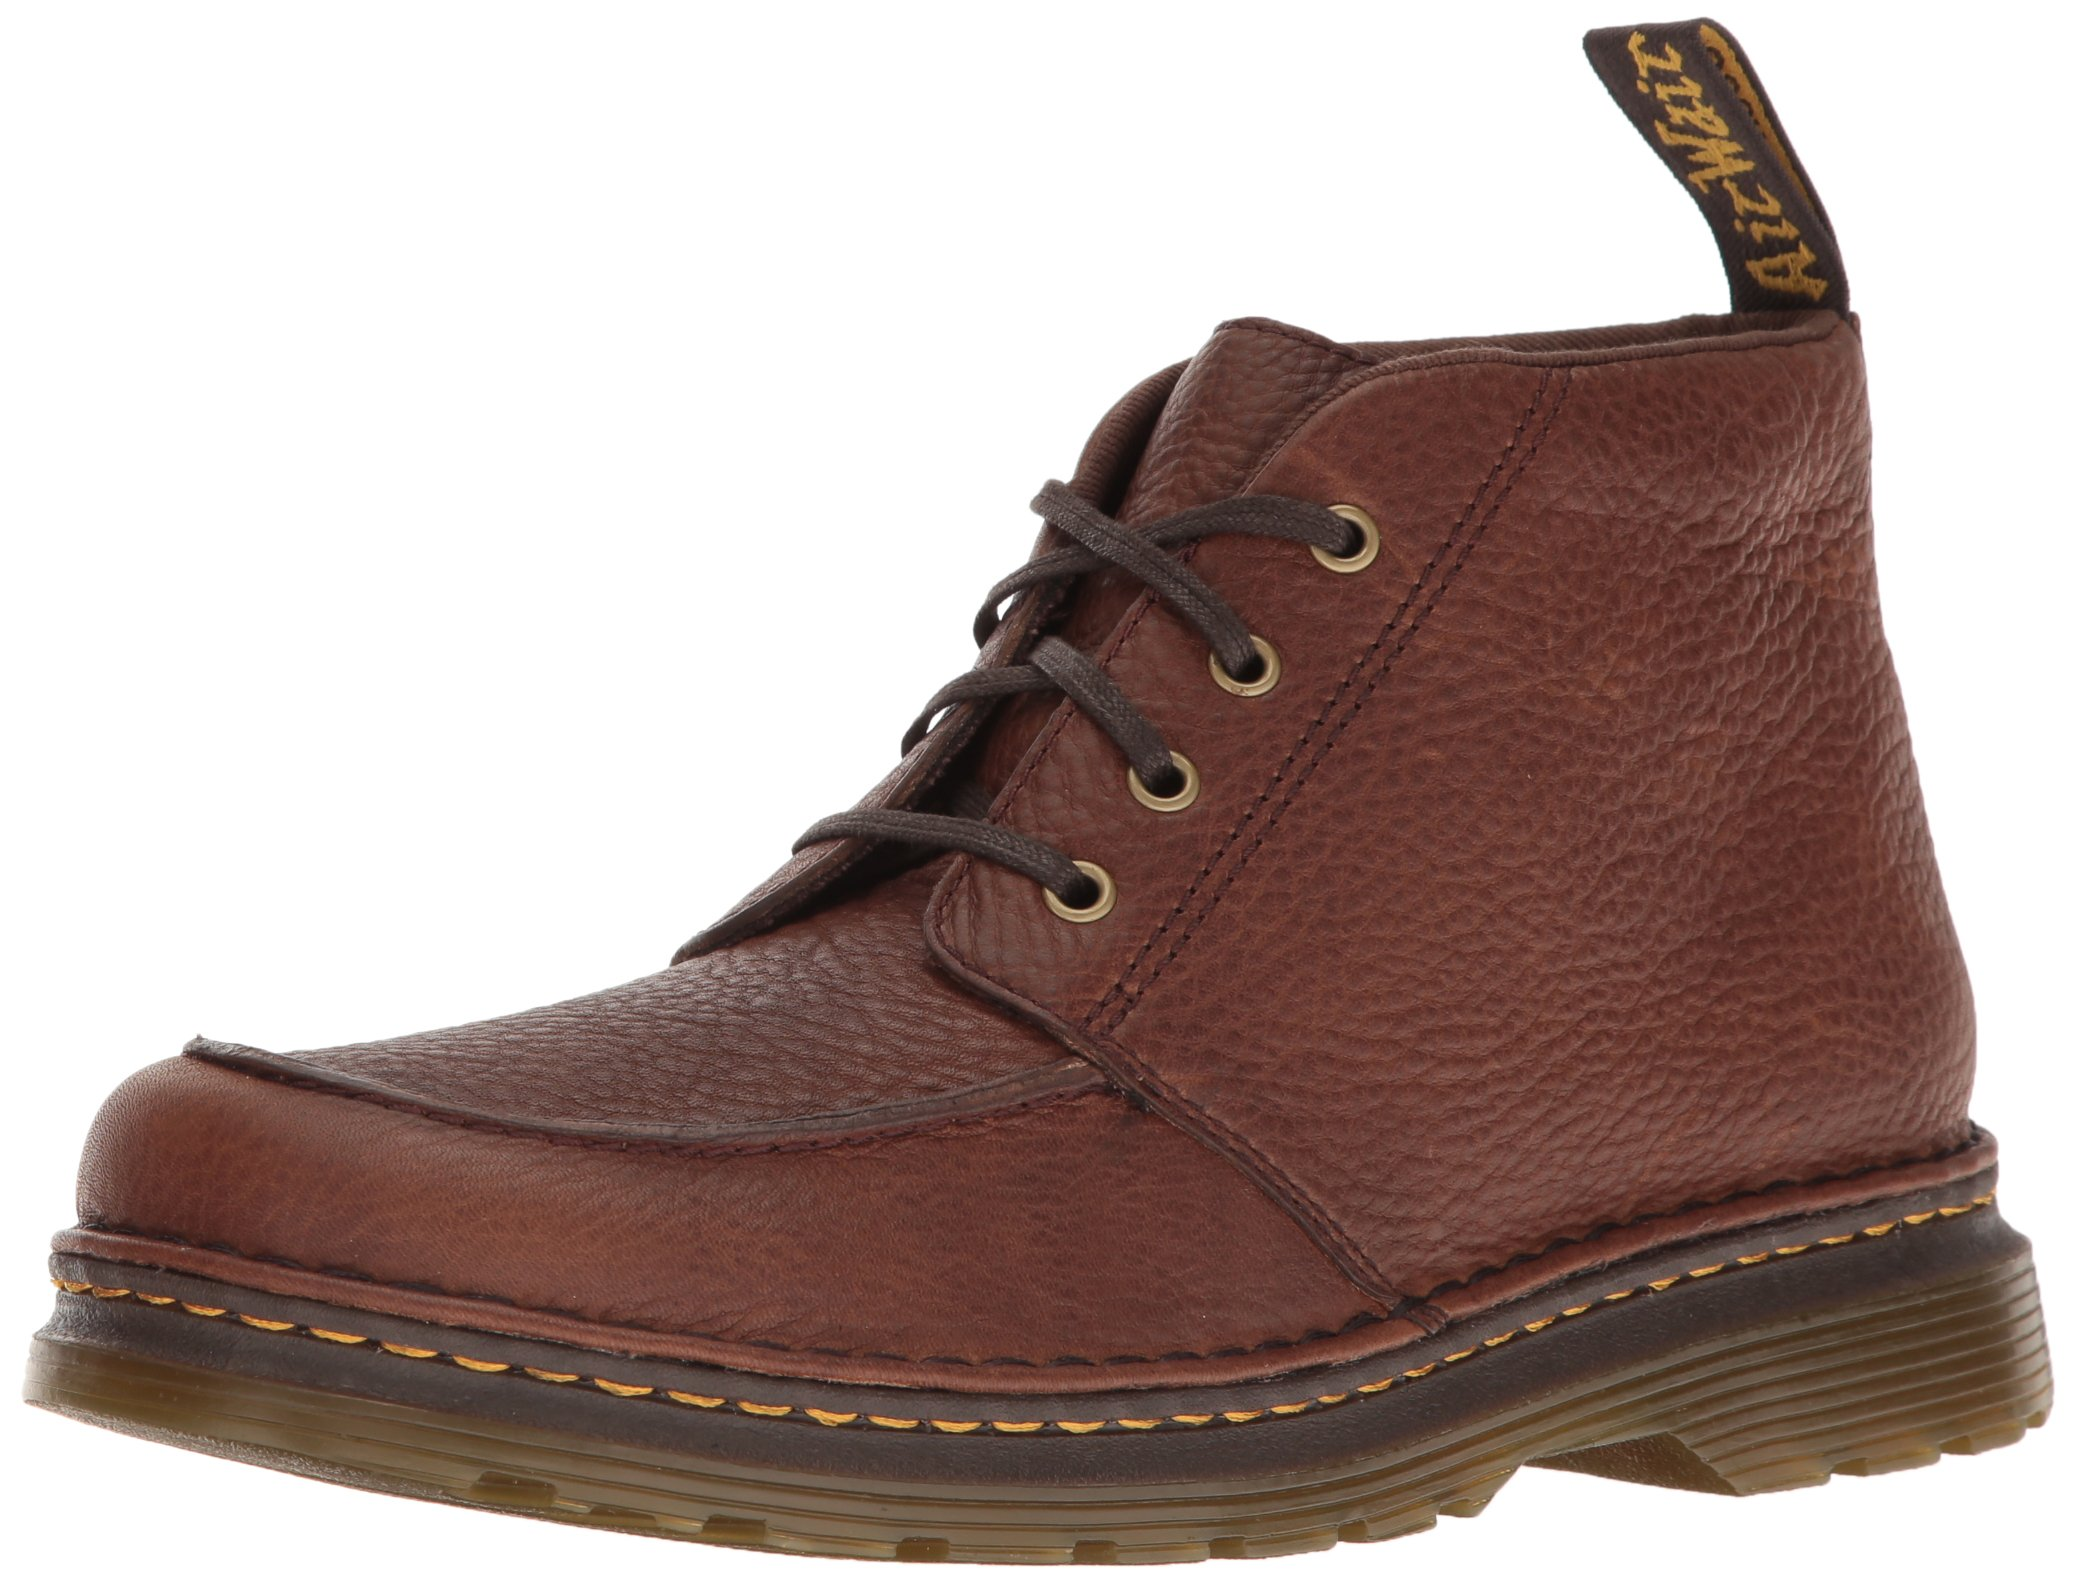 Dr. Martens Men's Austin Chukka Boot, Dark Brown, 9 UK/10 D US